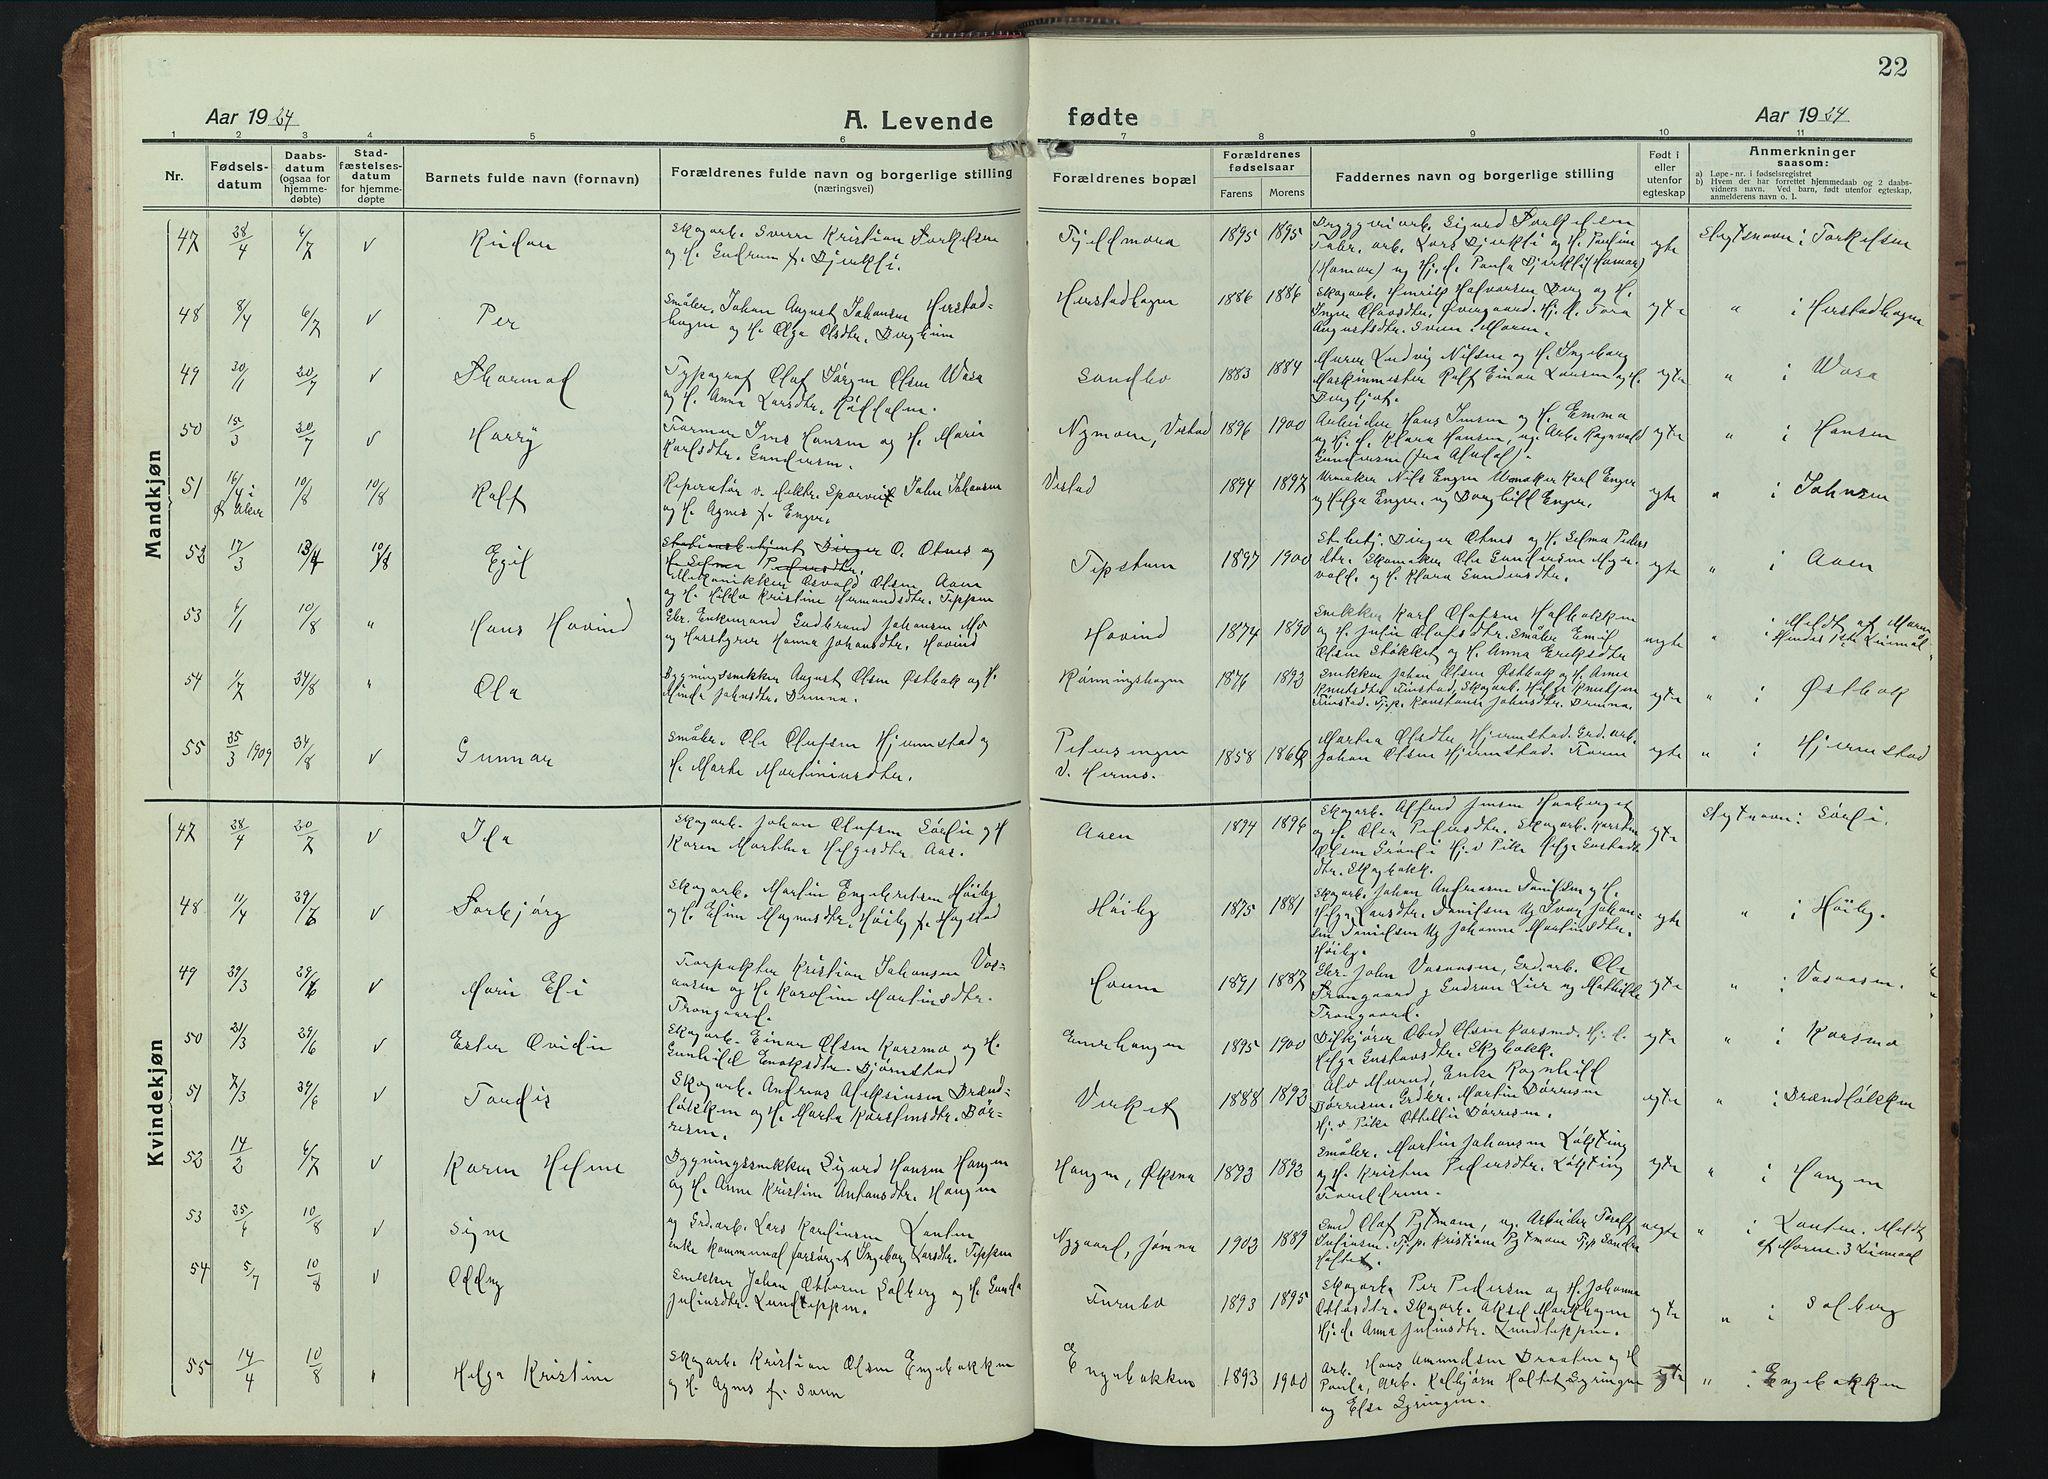 SAH, Elverum prestekontor, H/Ha/Hab/L0015#: Parish register (copy) no. 15, 1922-1945, p. 22